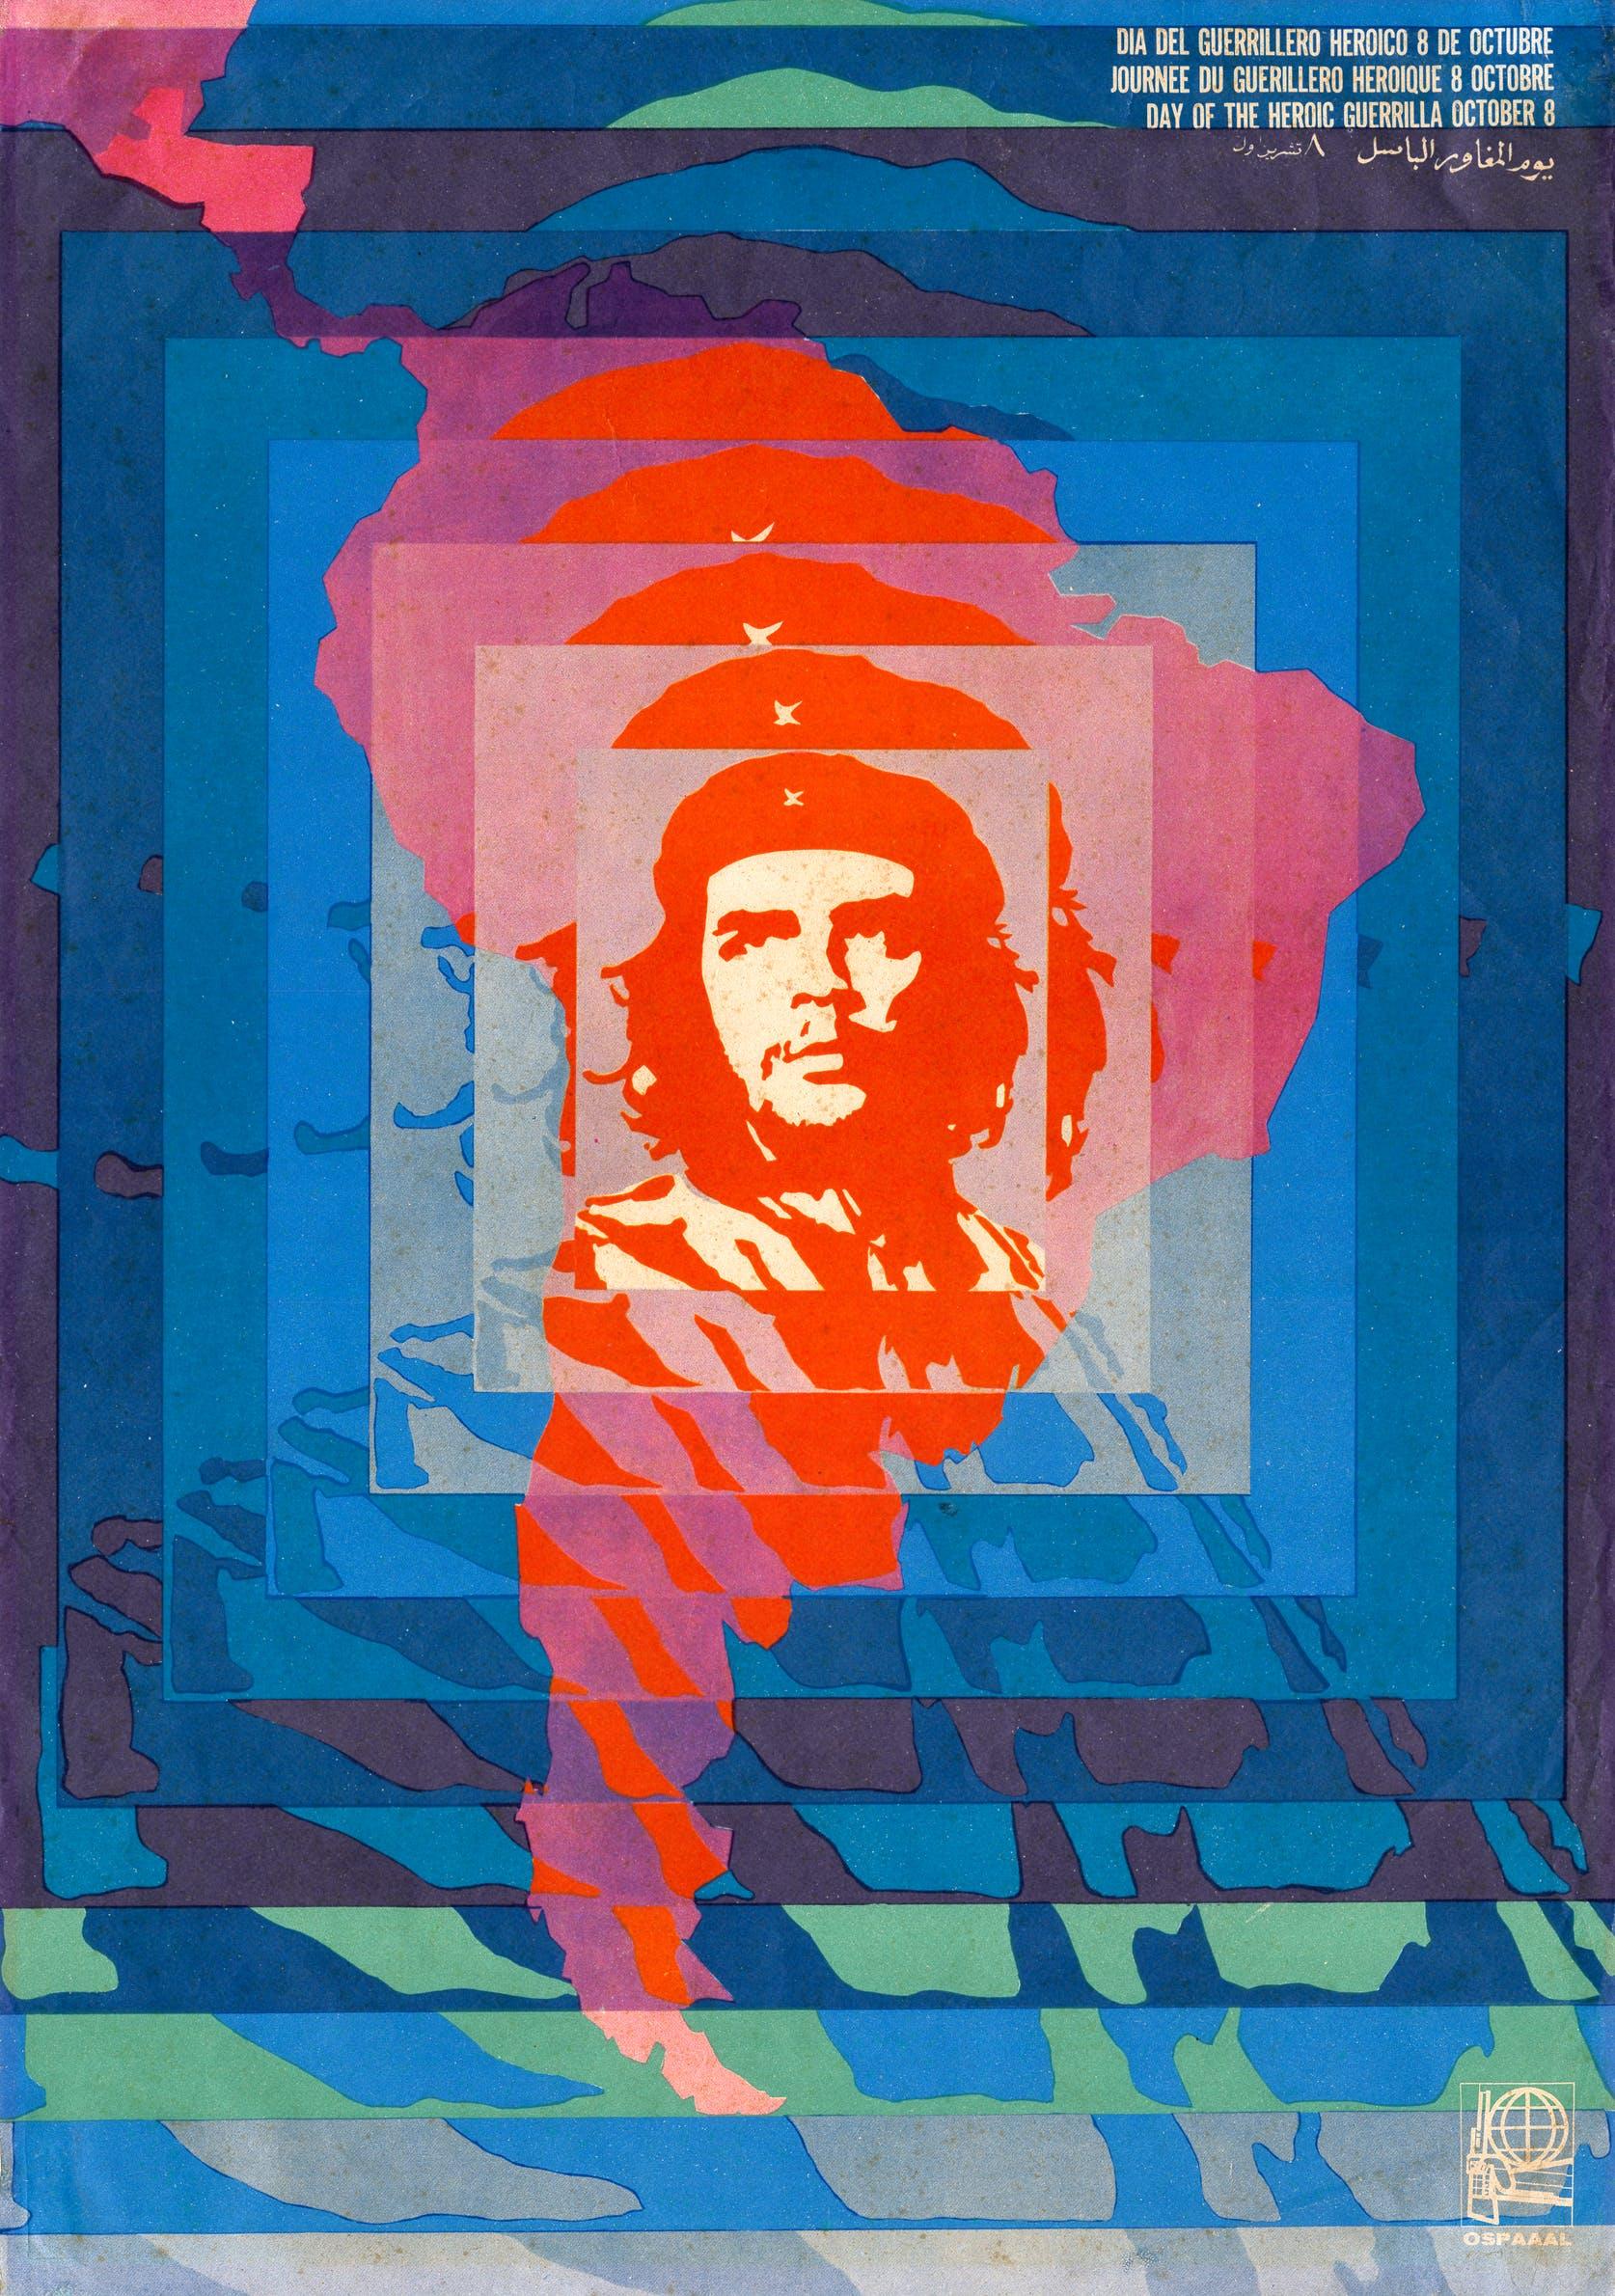 Día del Guerrillero Heroico (Day of the Heroic Fighter)